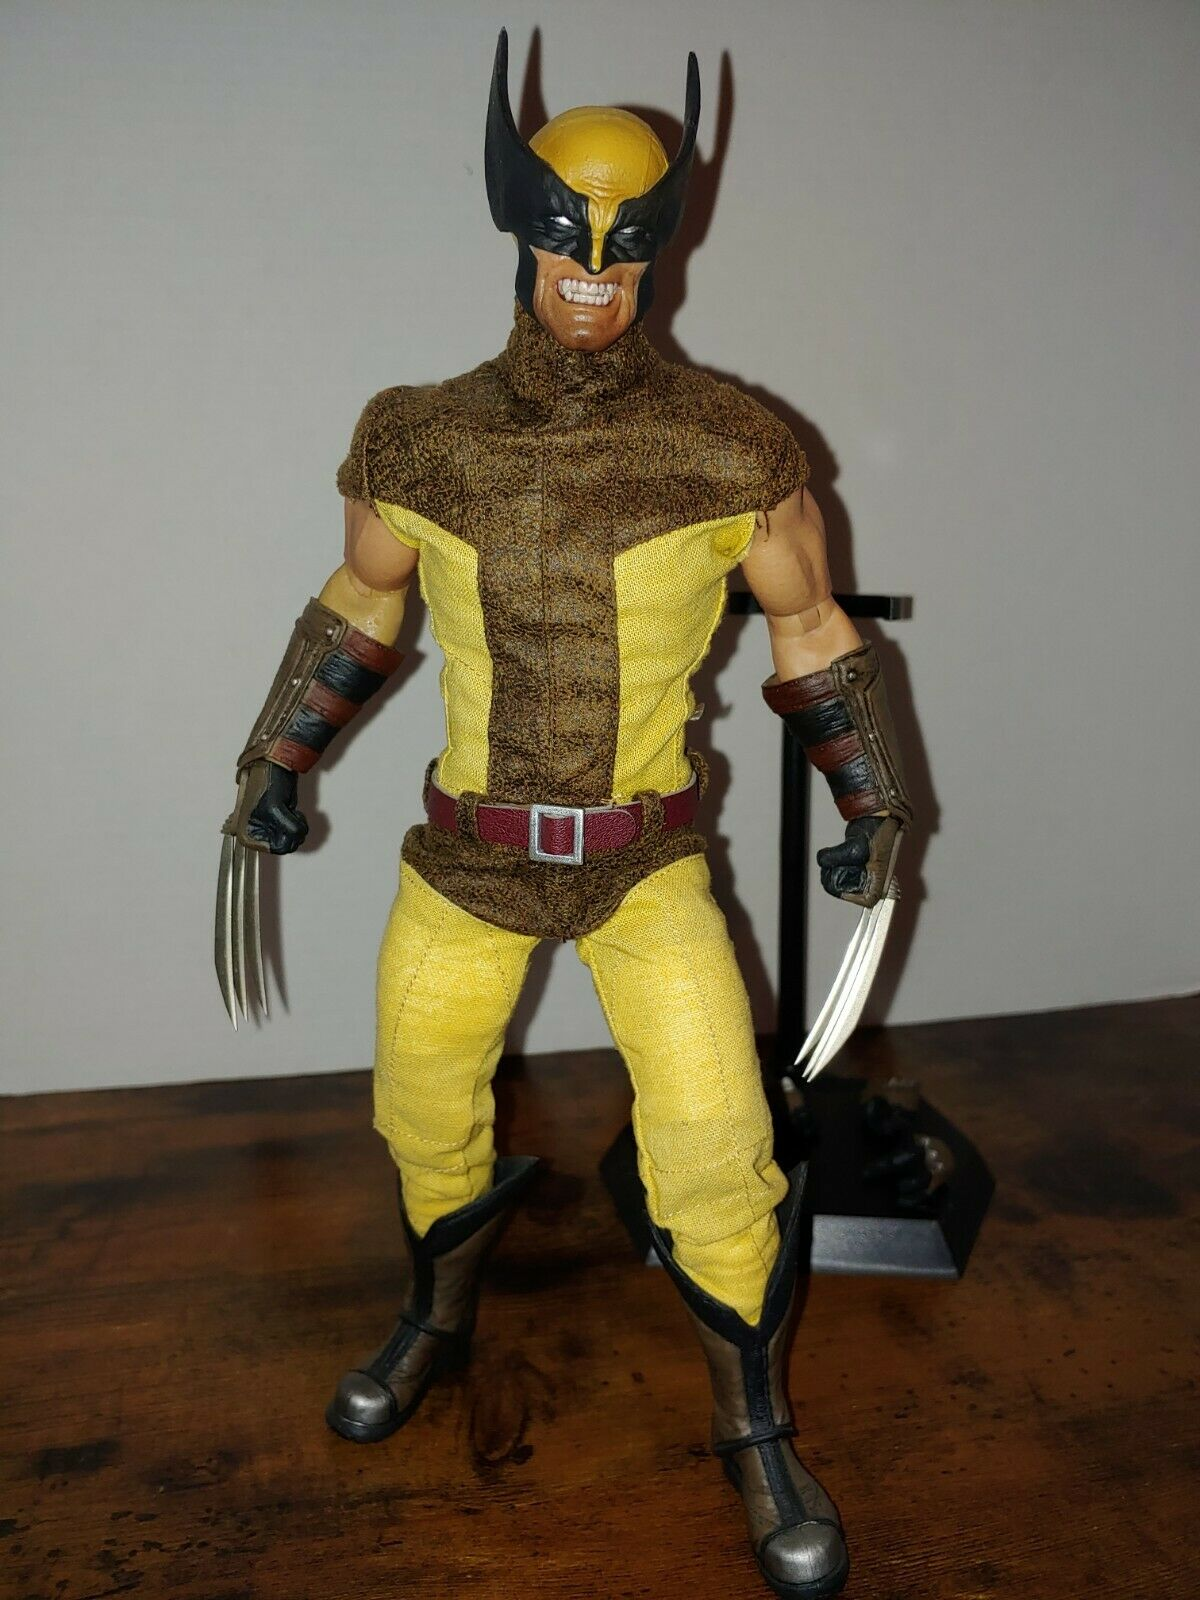 1/6 custom Wolverine Crazy Toys suit Ganghood body not Sideshow on eBay thumbnail